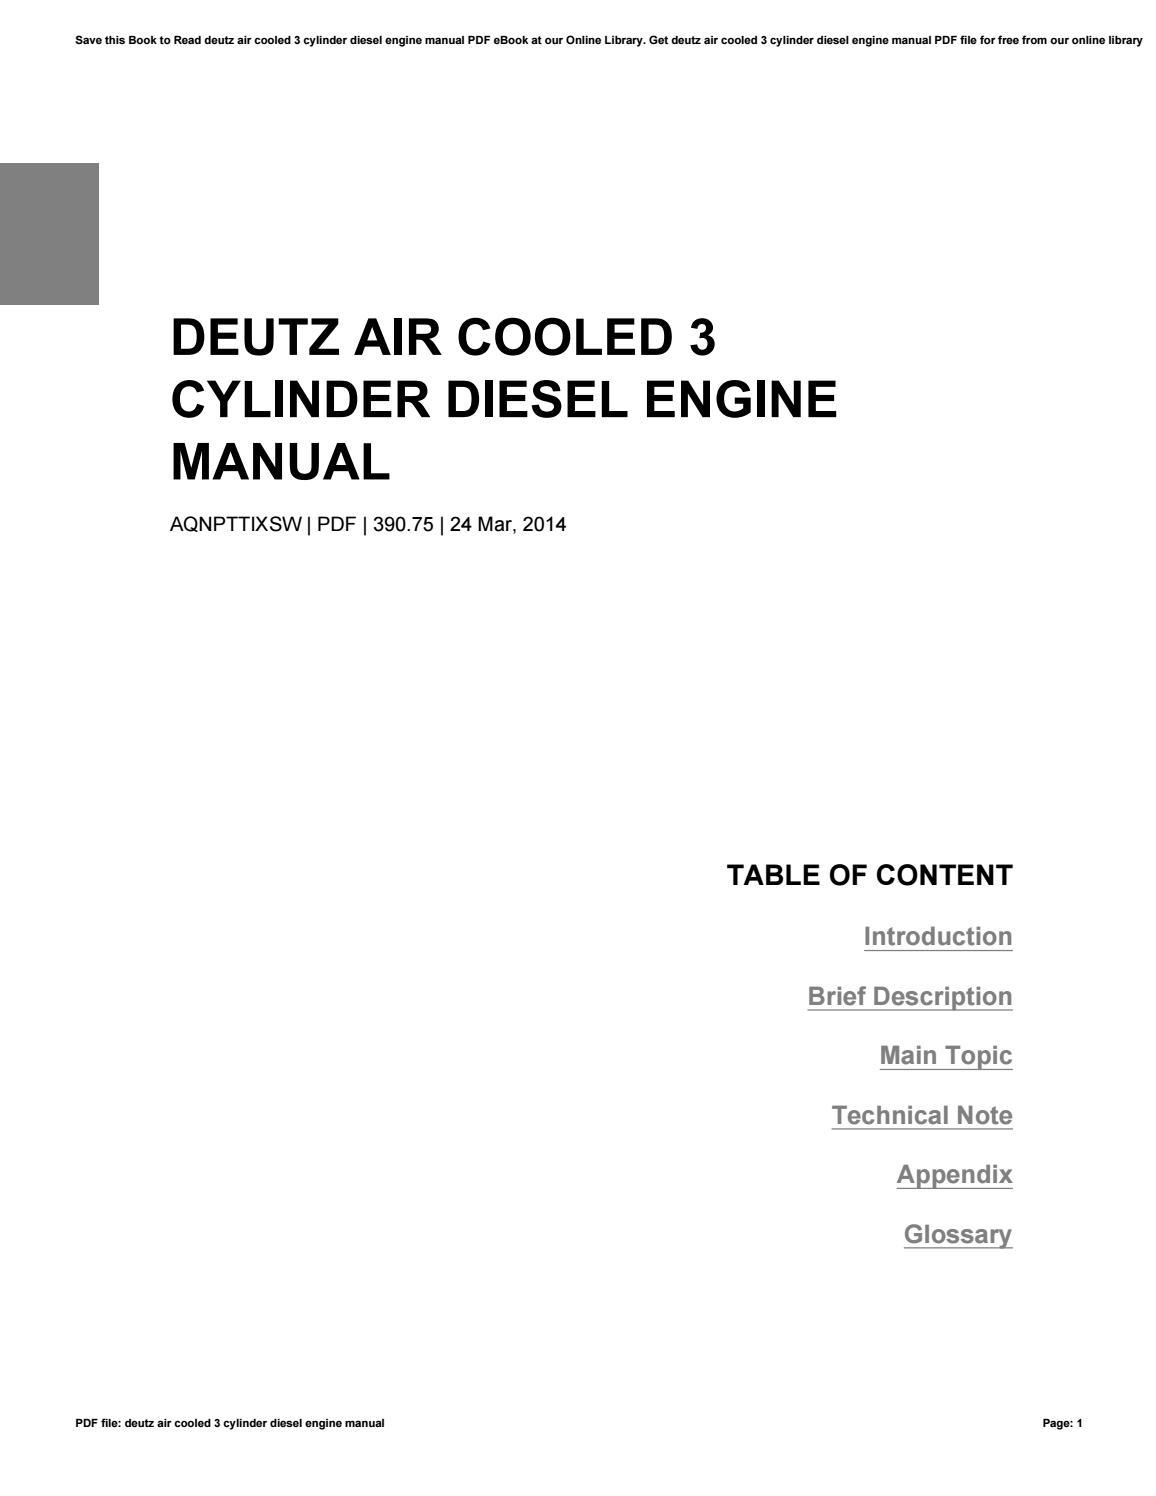 Deutz Air Cooled 3 Cylinder Diesel Engine Manual By Hezll7 Issuu